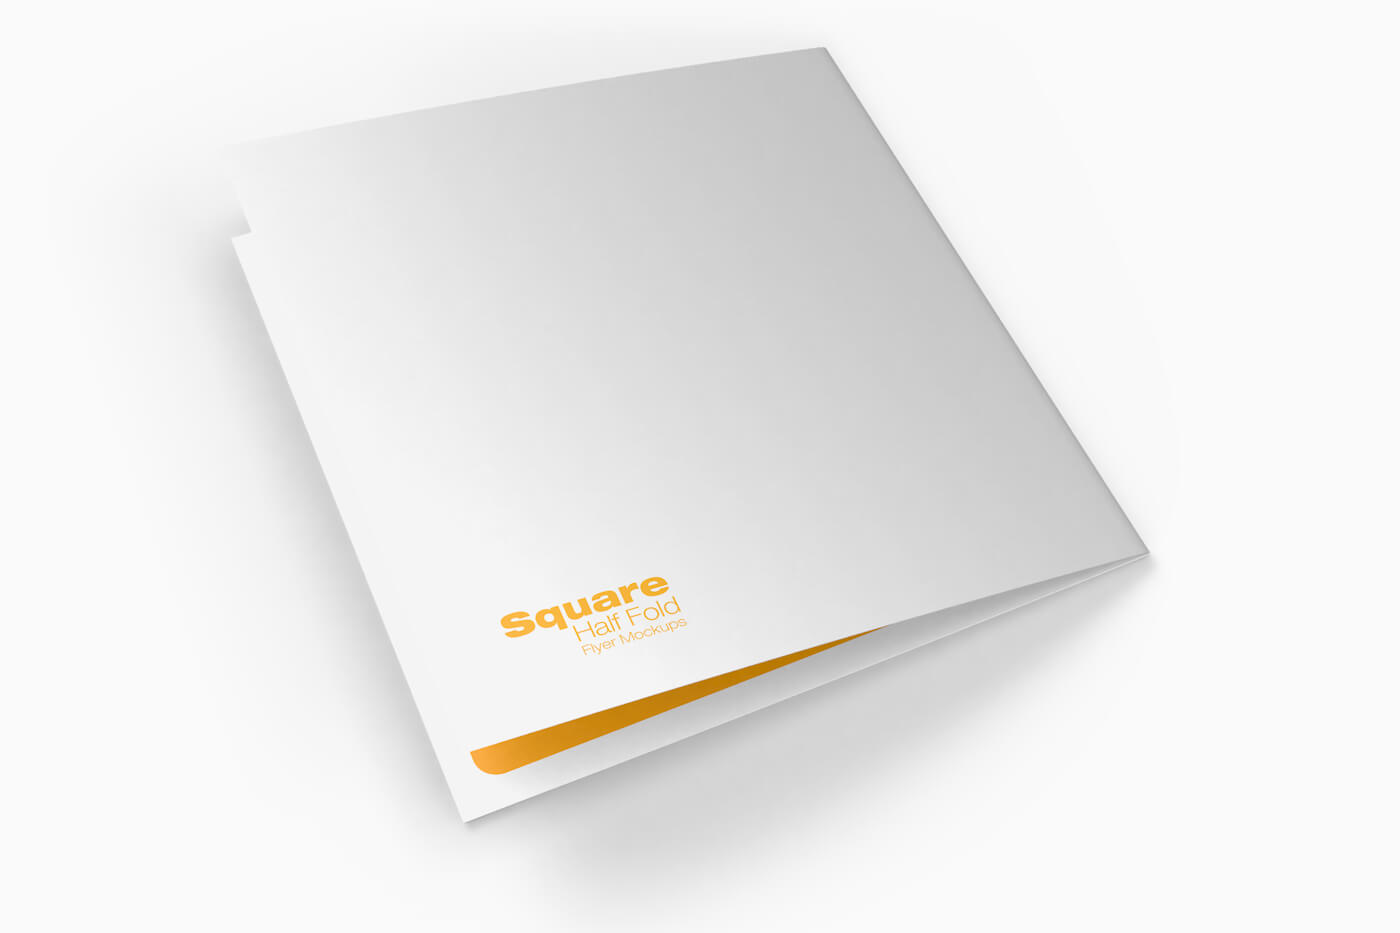 Square Half Fold Brochure Mockups 06 1